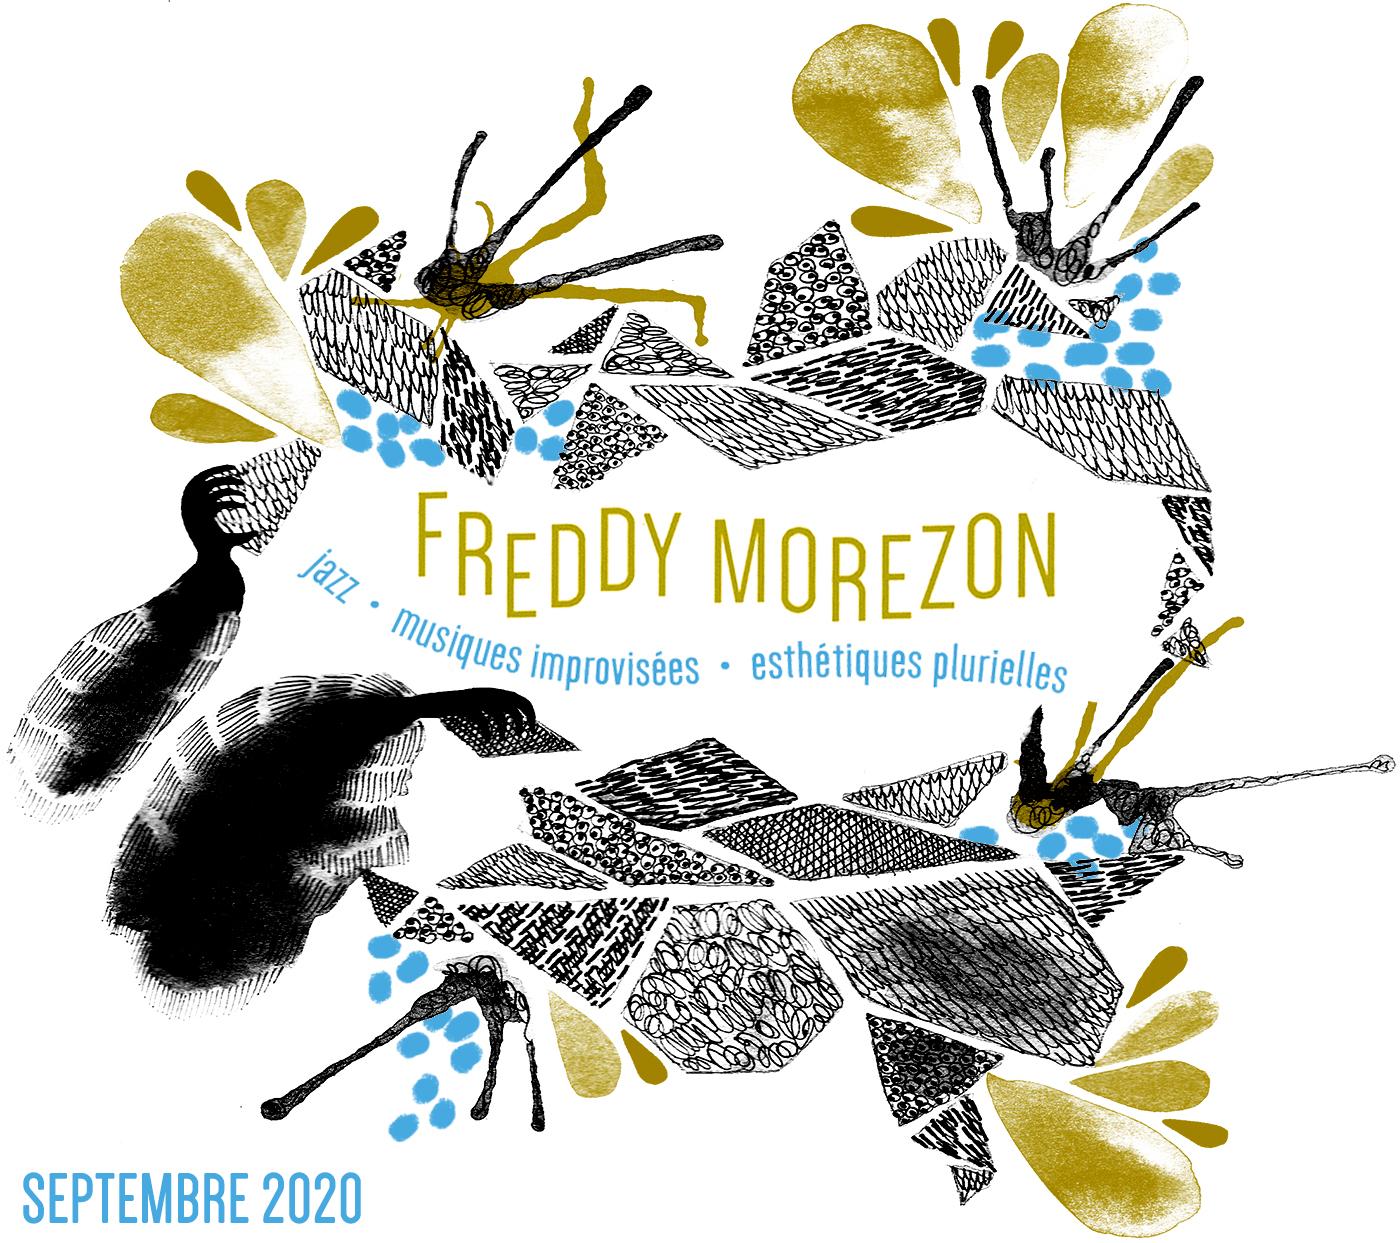 Freddy Morezon - Newsletter septembre 2020